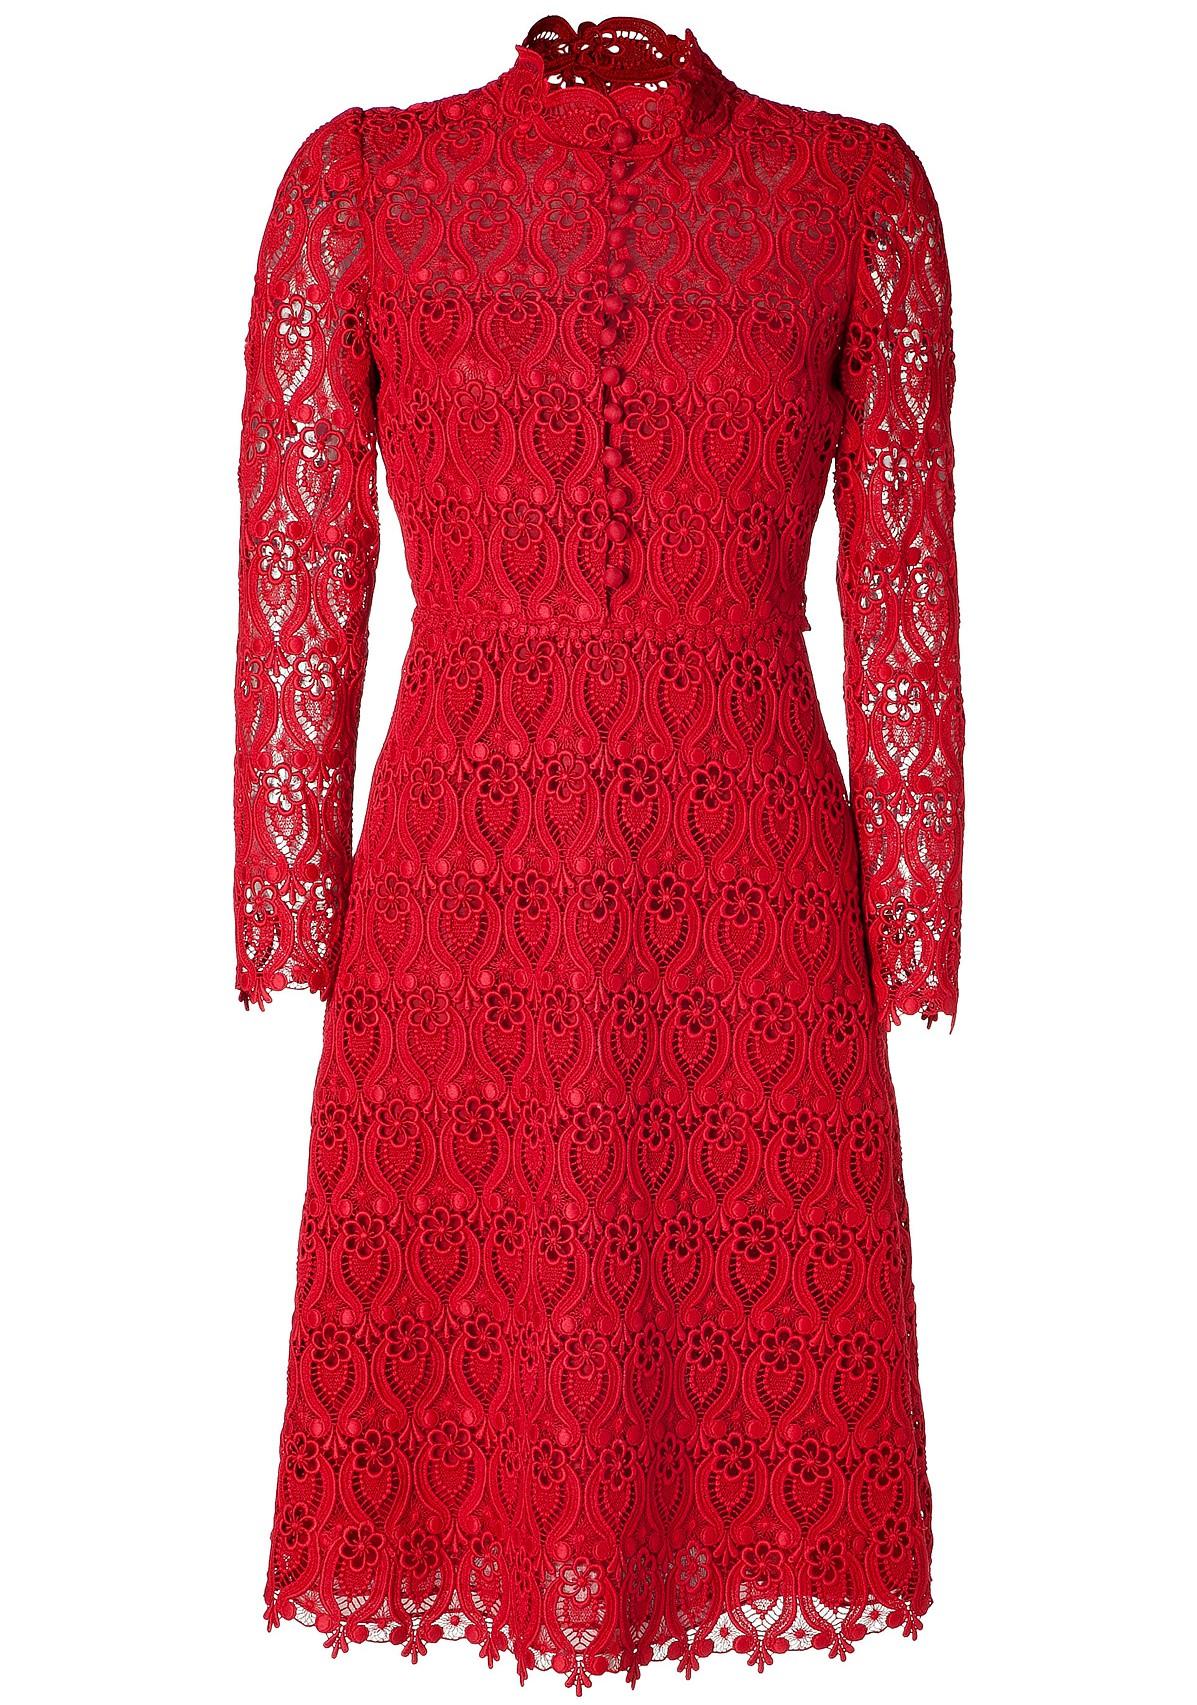 Samba Red Bridesmaids Dress from Stylebop